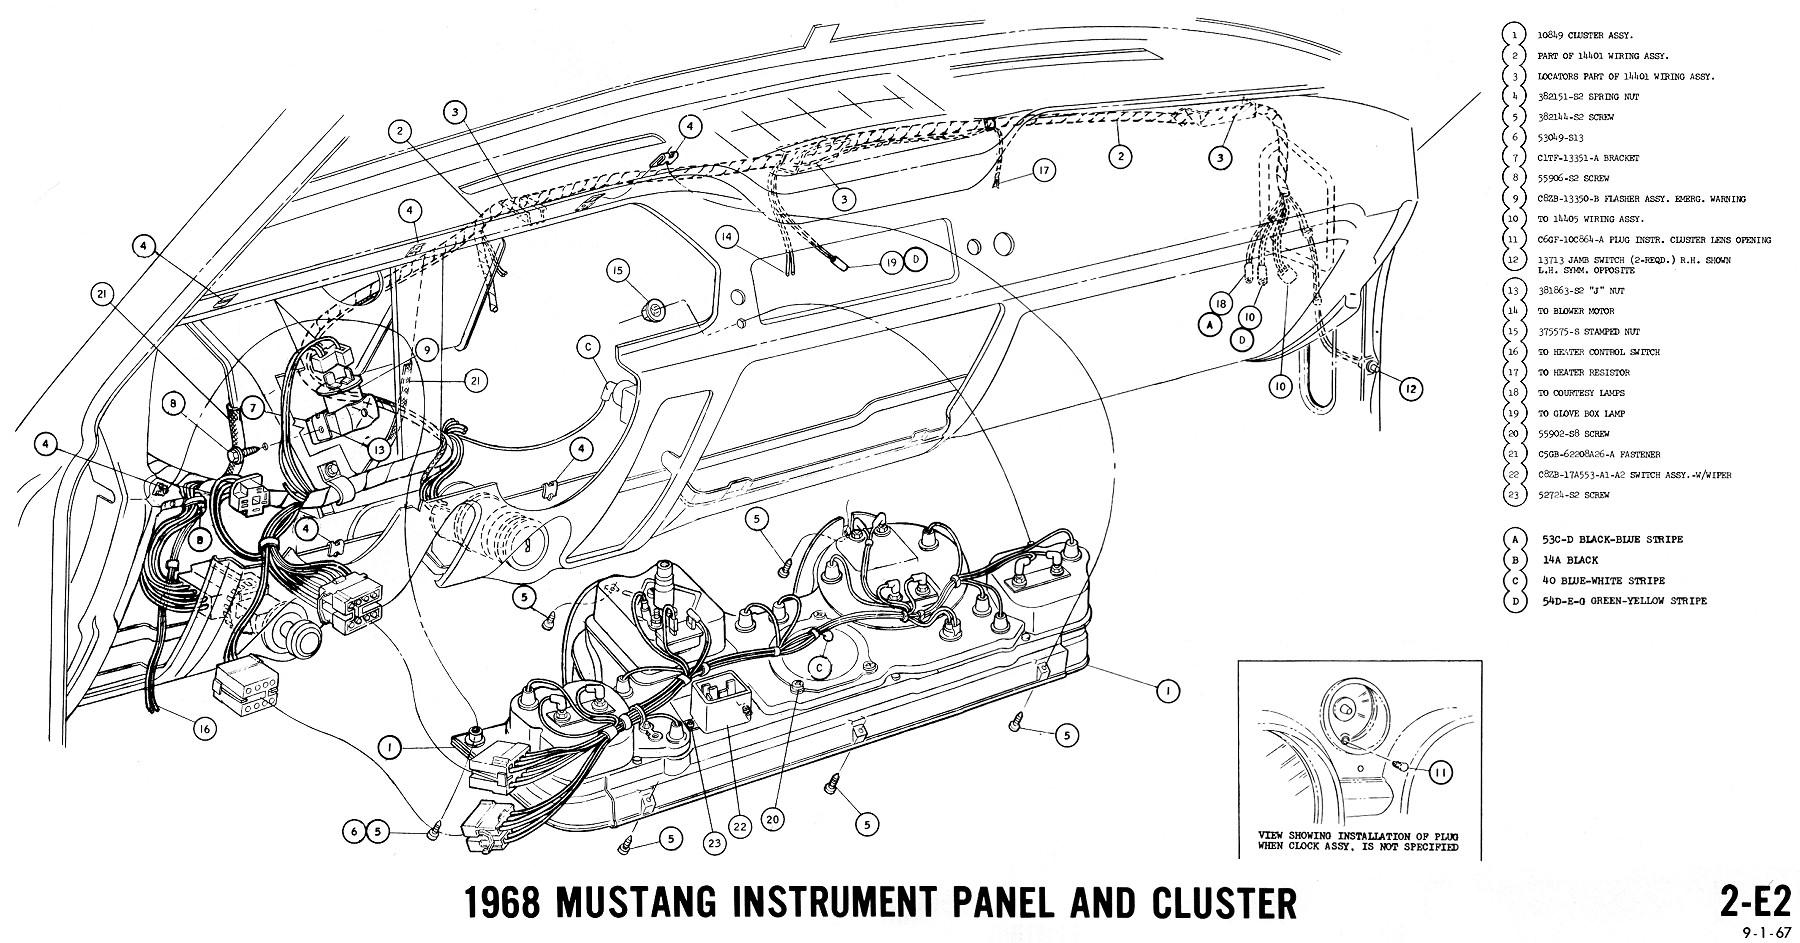 1968 mustang wiring diagrams evolving software 2003 mustang pcm diagram master wiring diagram 68 mustang fuse diagrams #14